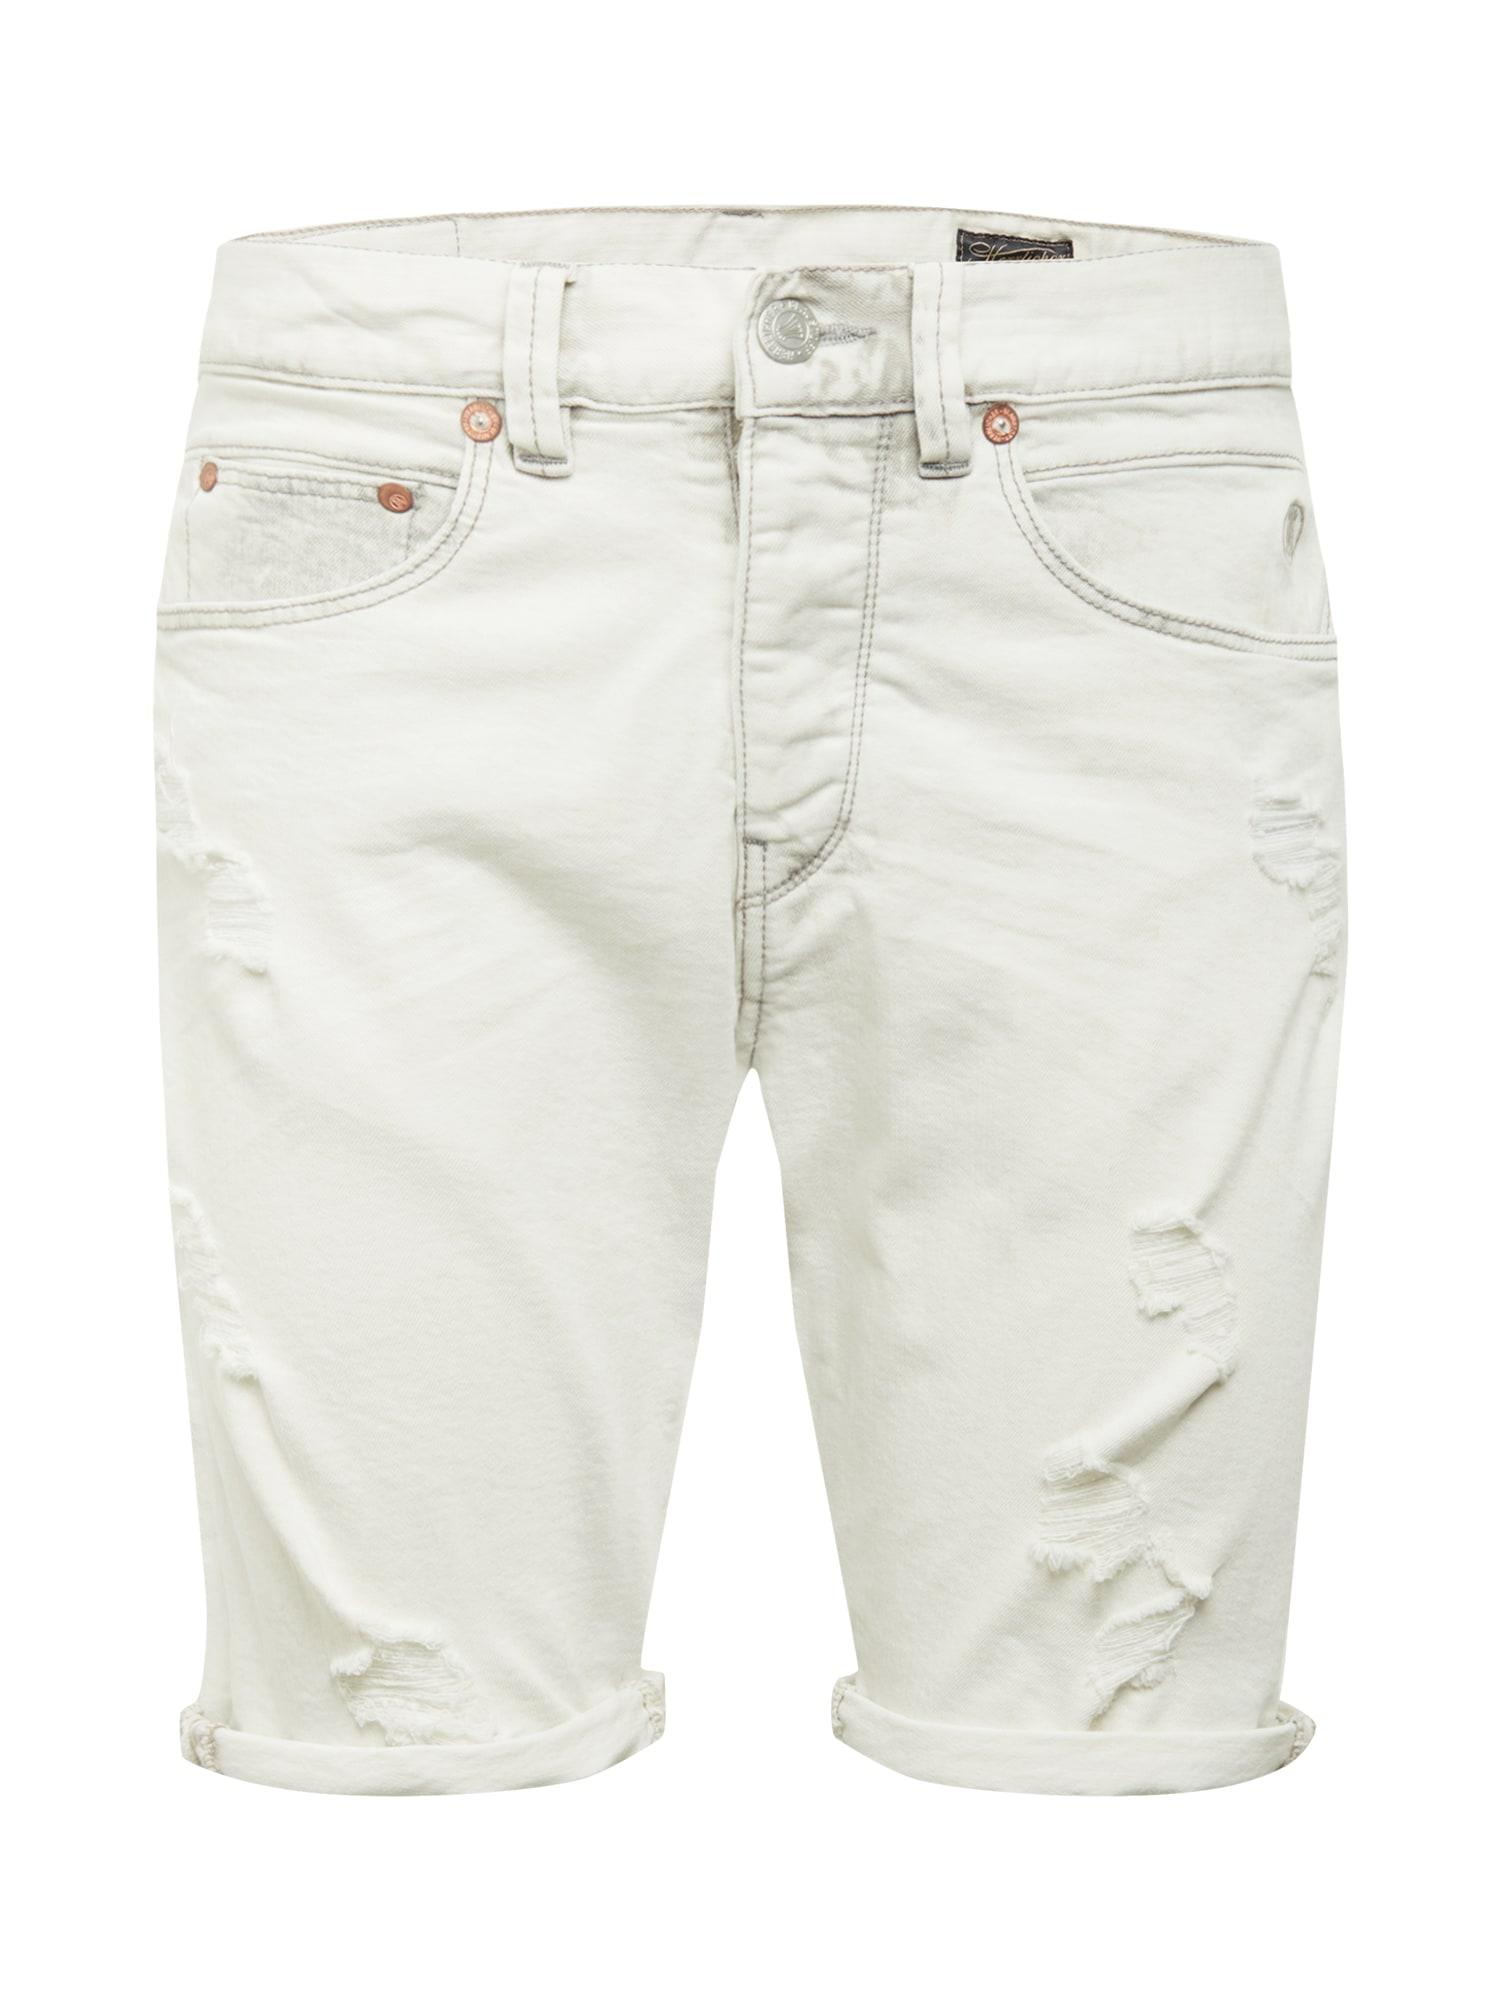 Herrlicher Džinsai 'Tyler' balto džinso spalva